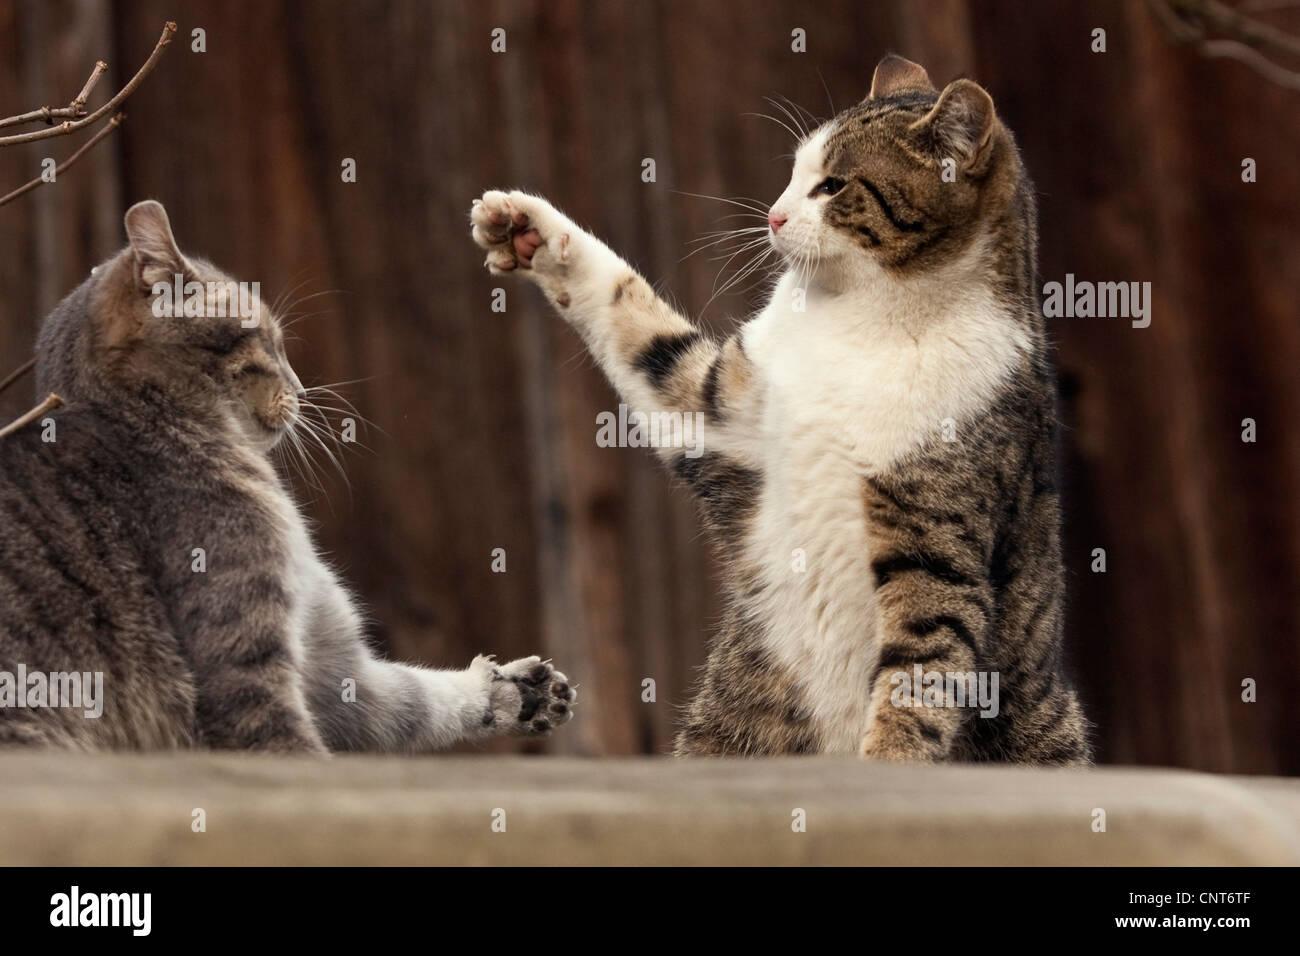 domestic cat, house cat (Felis silvestris f. catus), 2 animals fighting - Stock Image